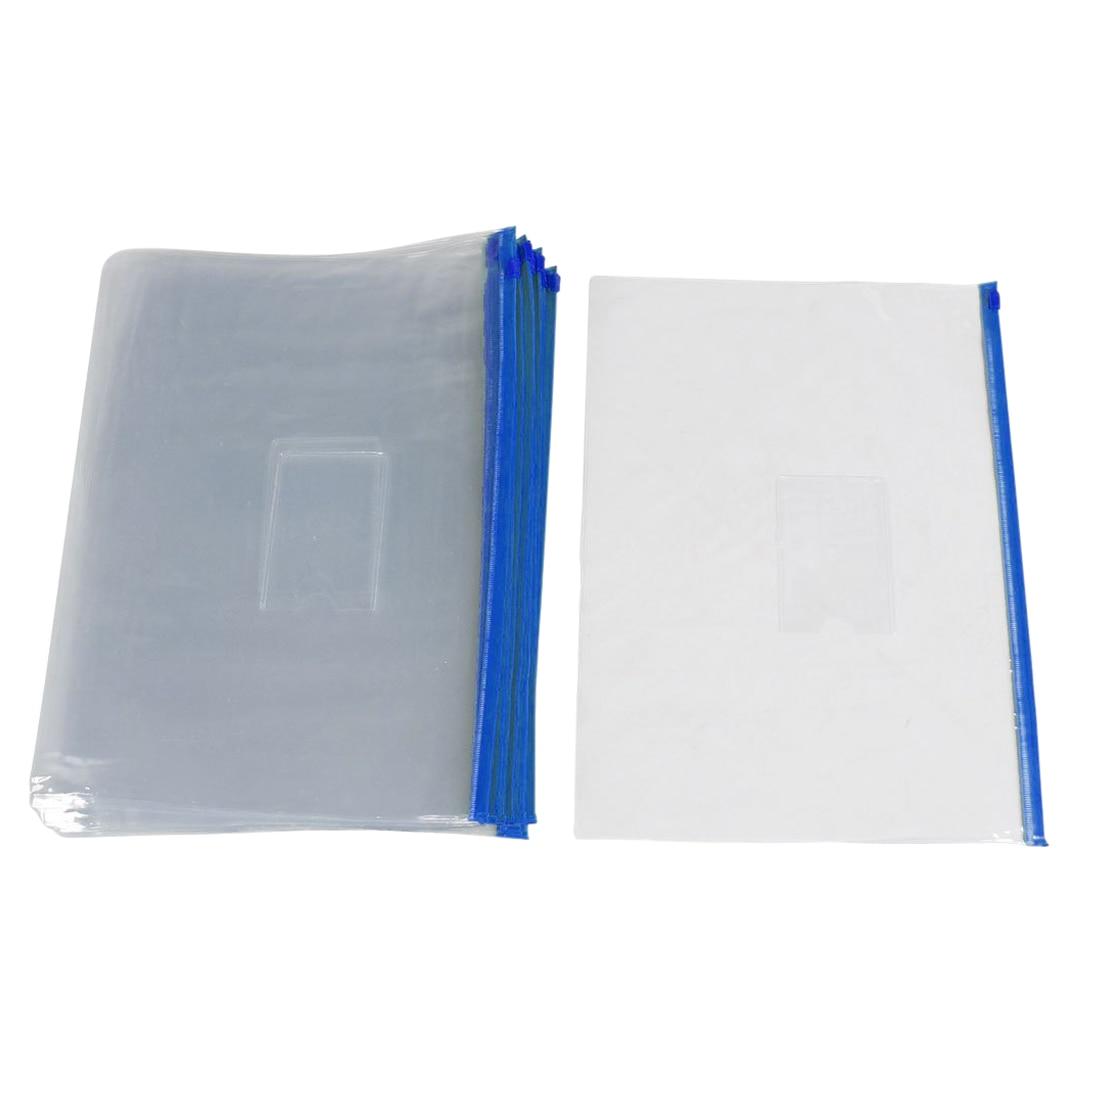 20 Pieces Transparent Blue Plastic Bag With A Zipper Slide Holder A4 Paper Bag